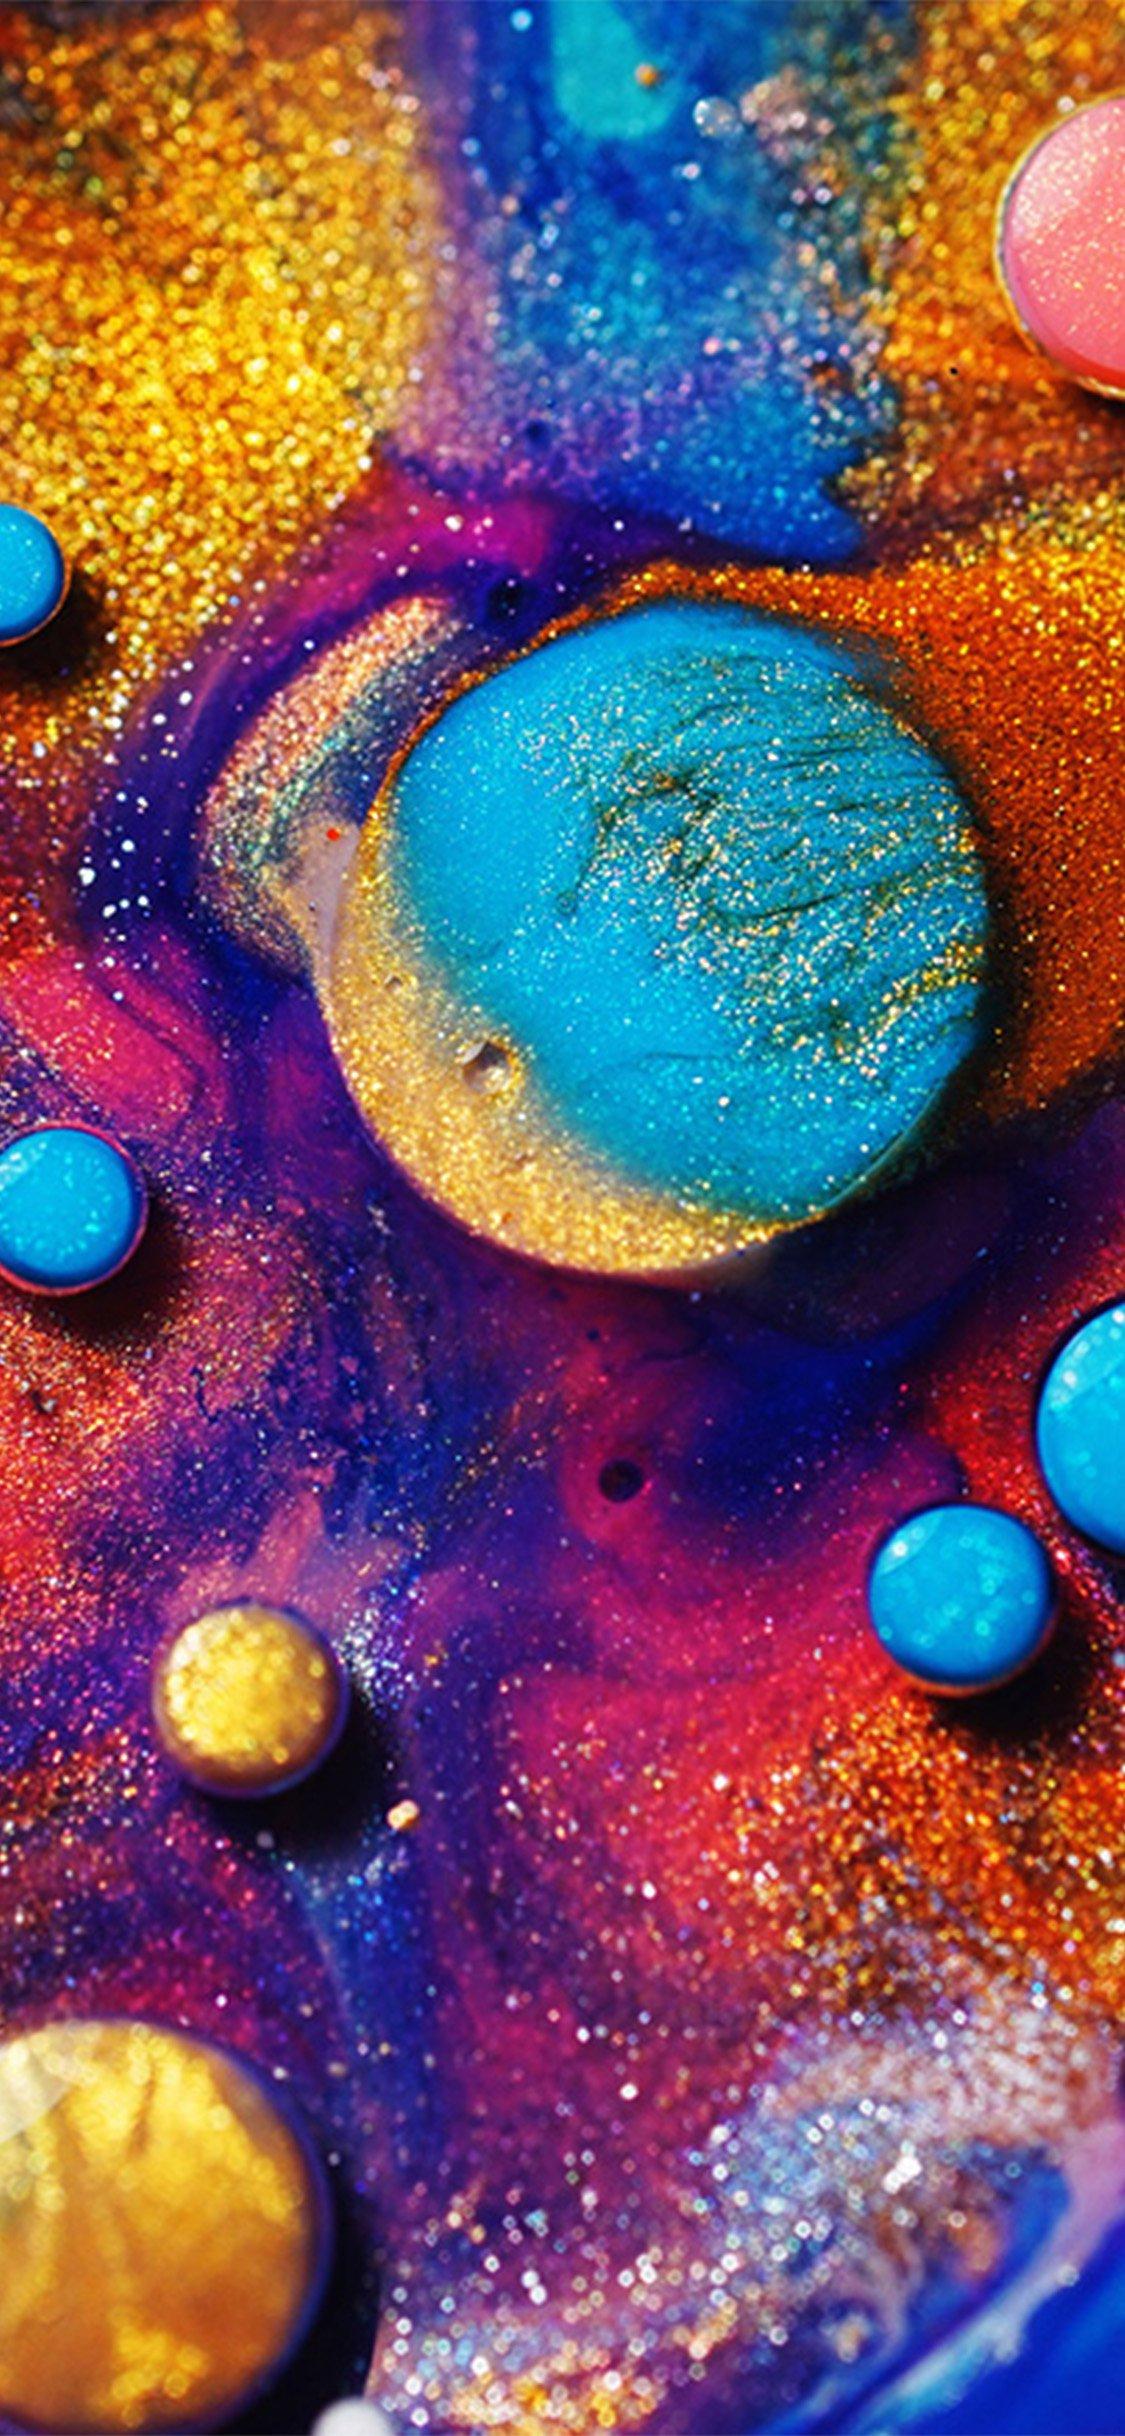 Makeup Color Art Pattern Background Iphone X Wallpaper Download